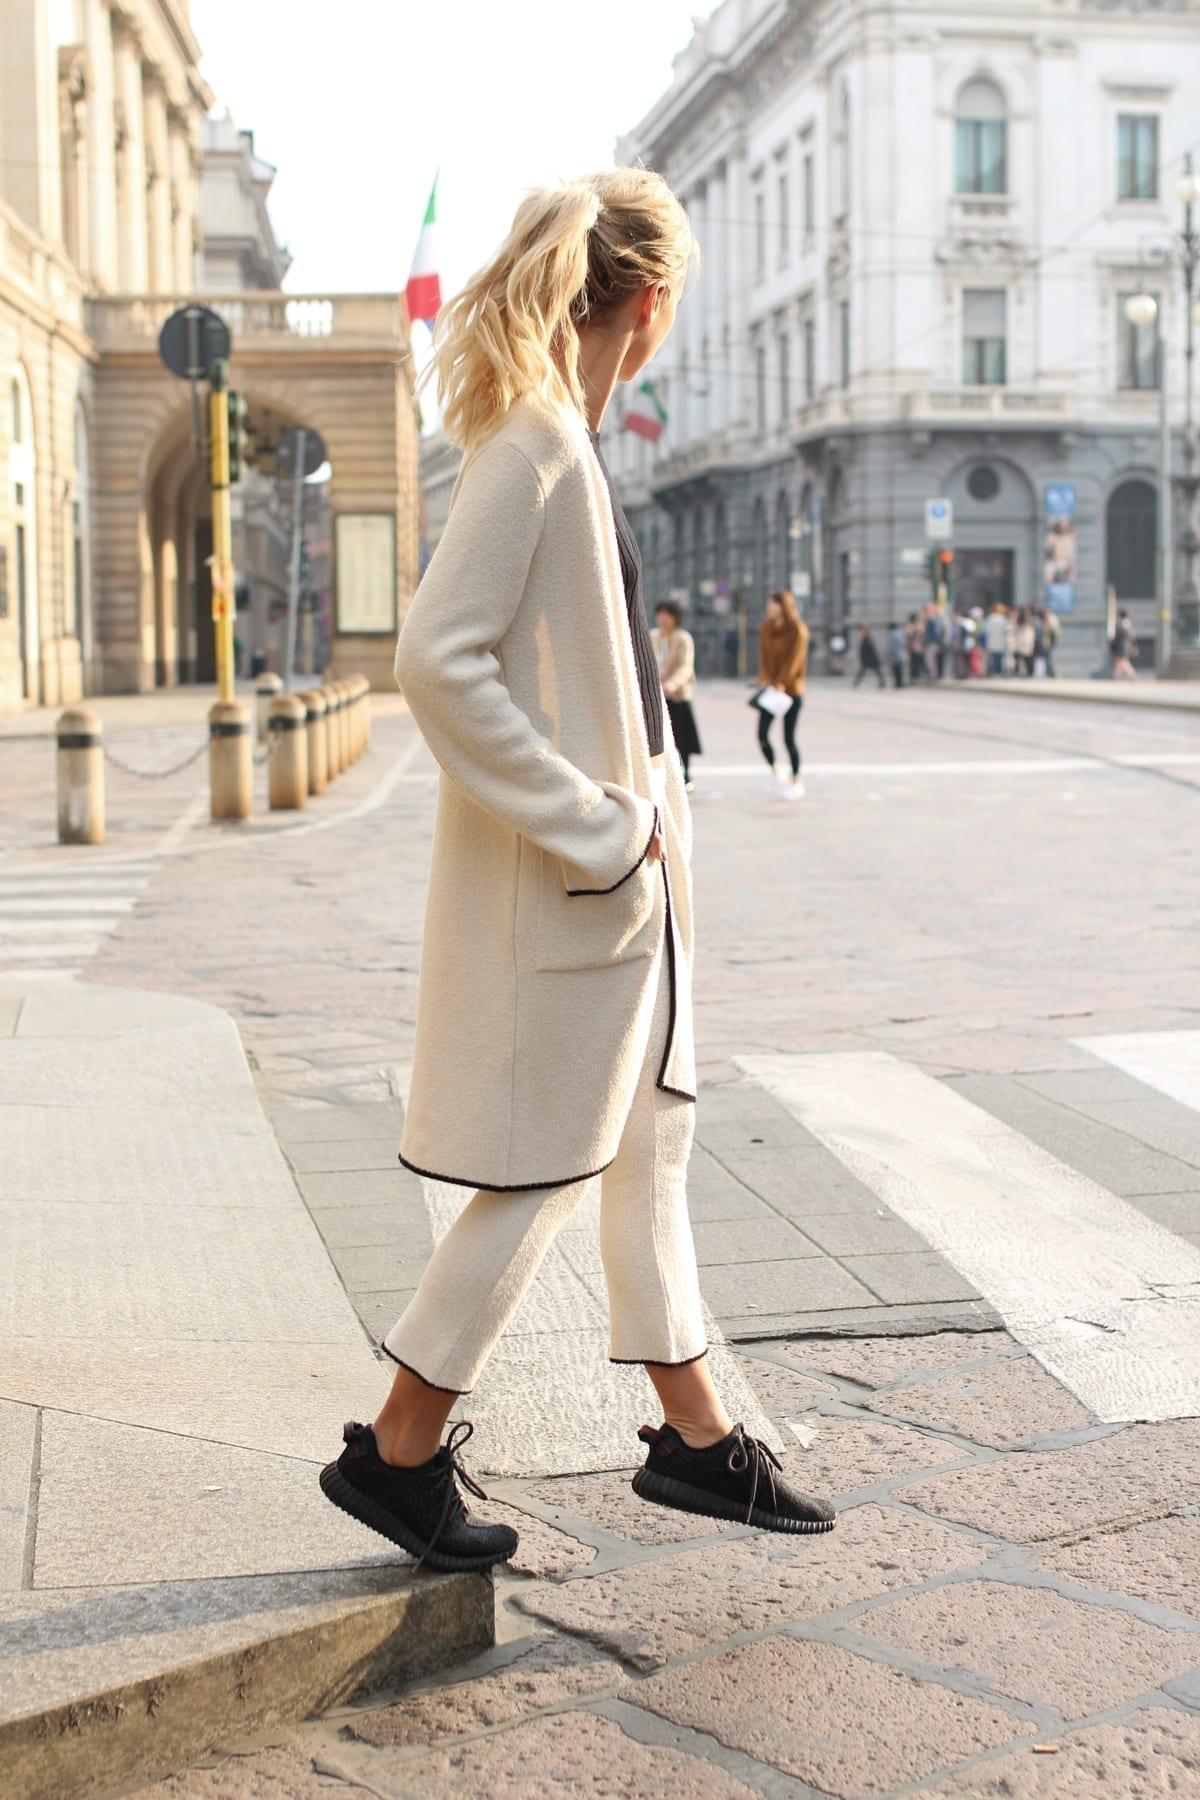 CK_1604_Constantly-K-milano-street-style-fashion-la-scala